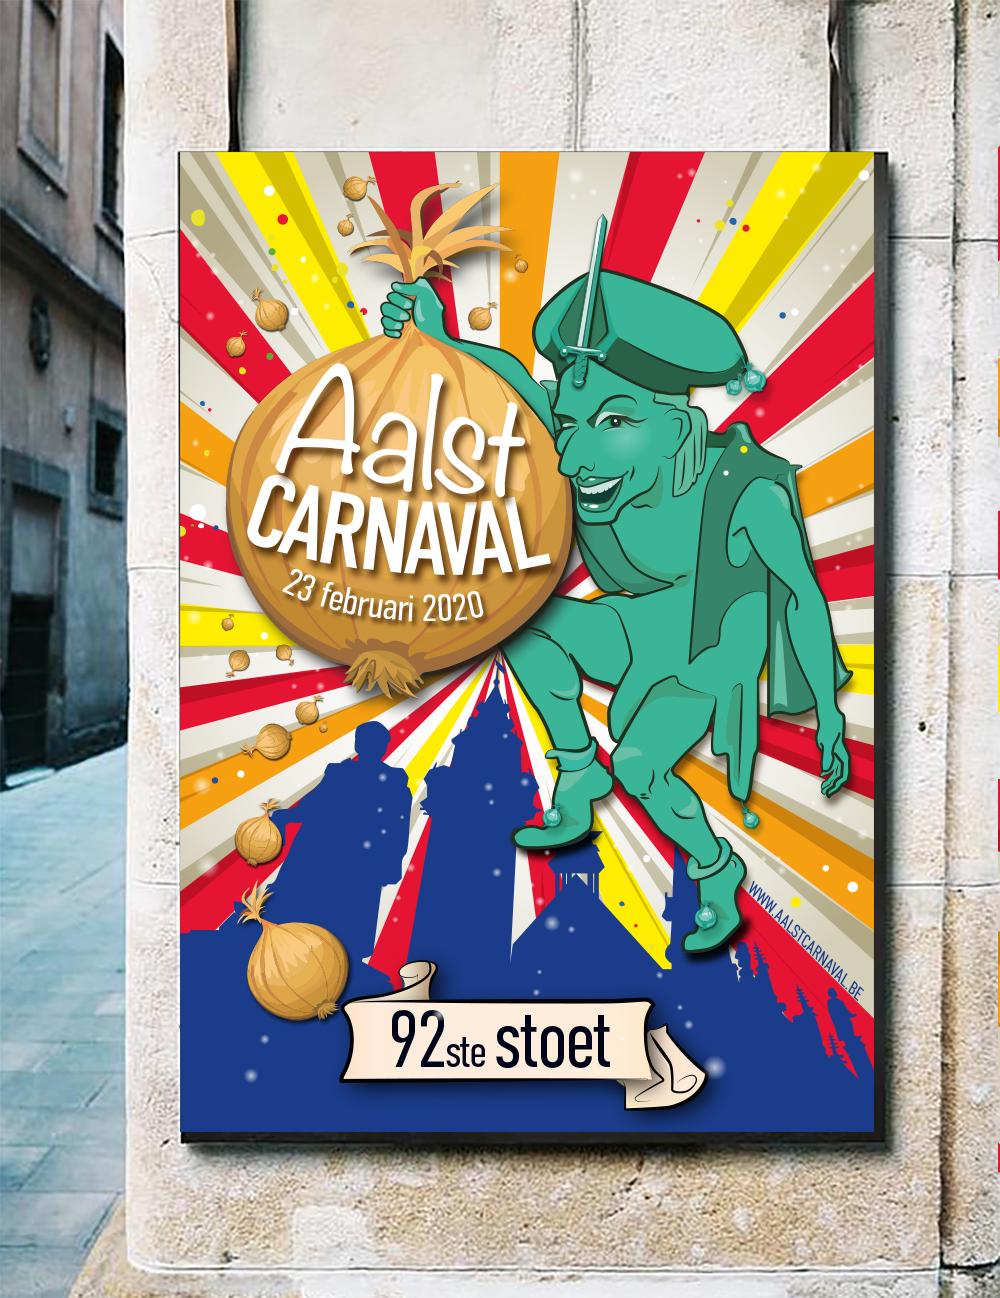 Poster design A1 Carnaval Aalst 2020